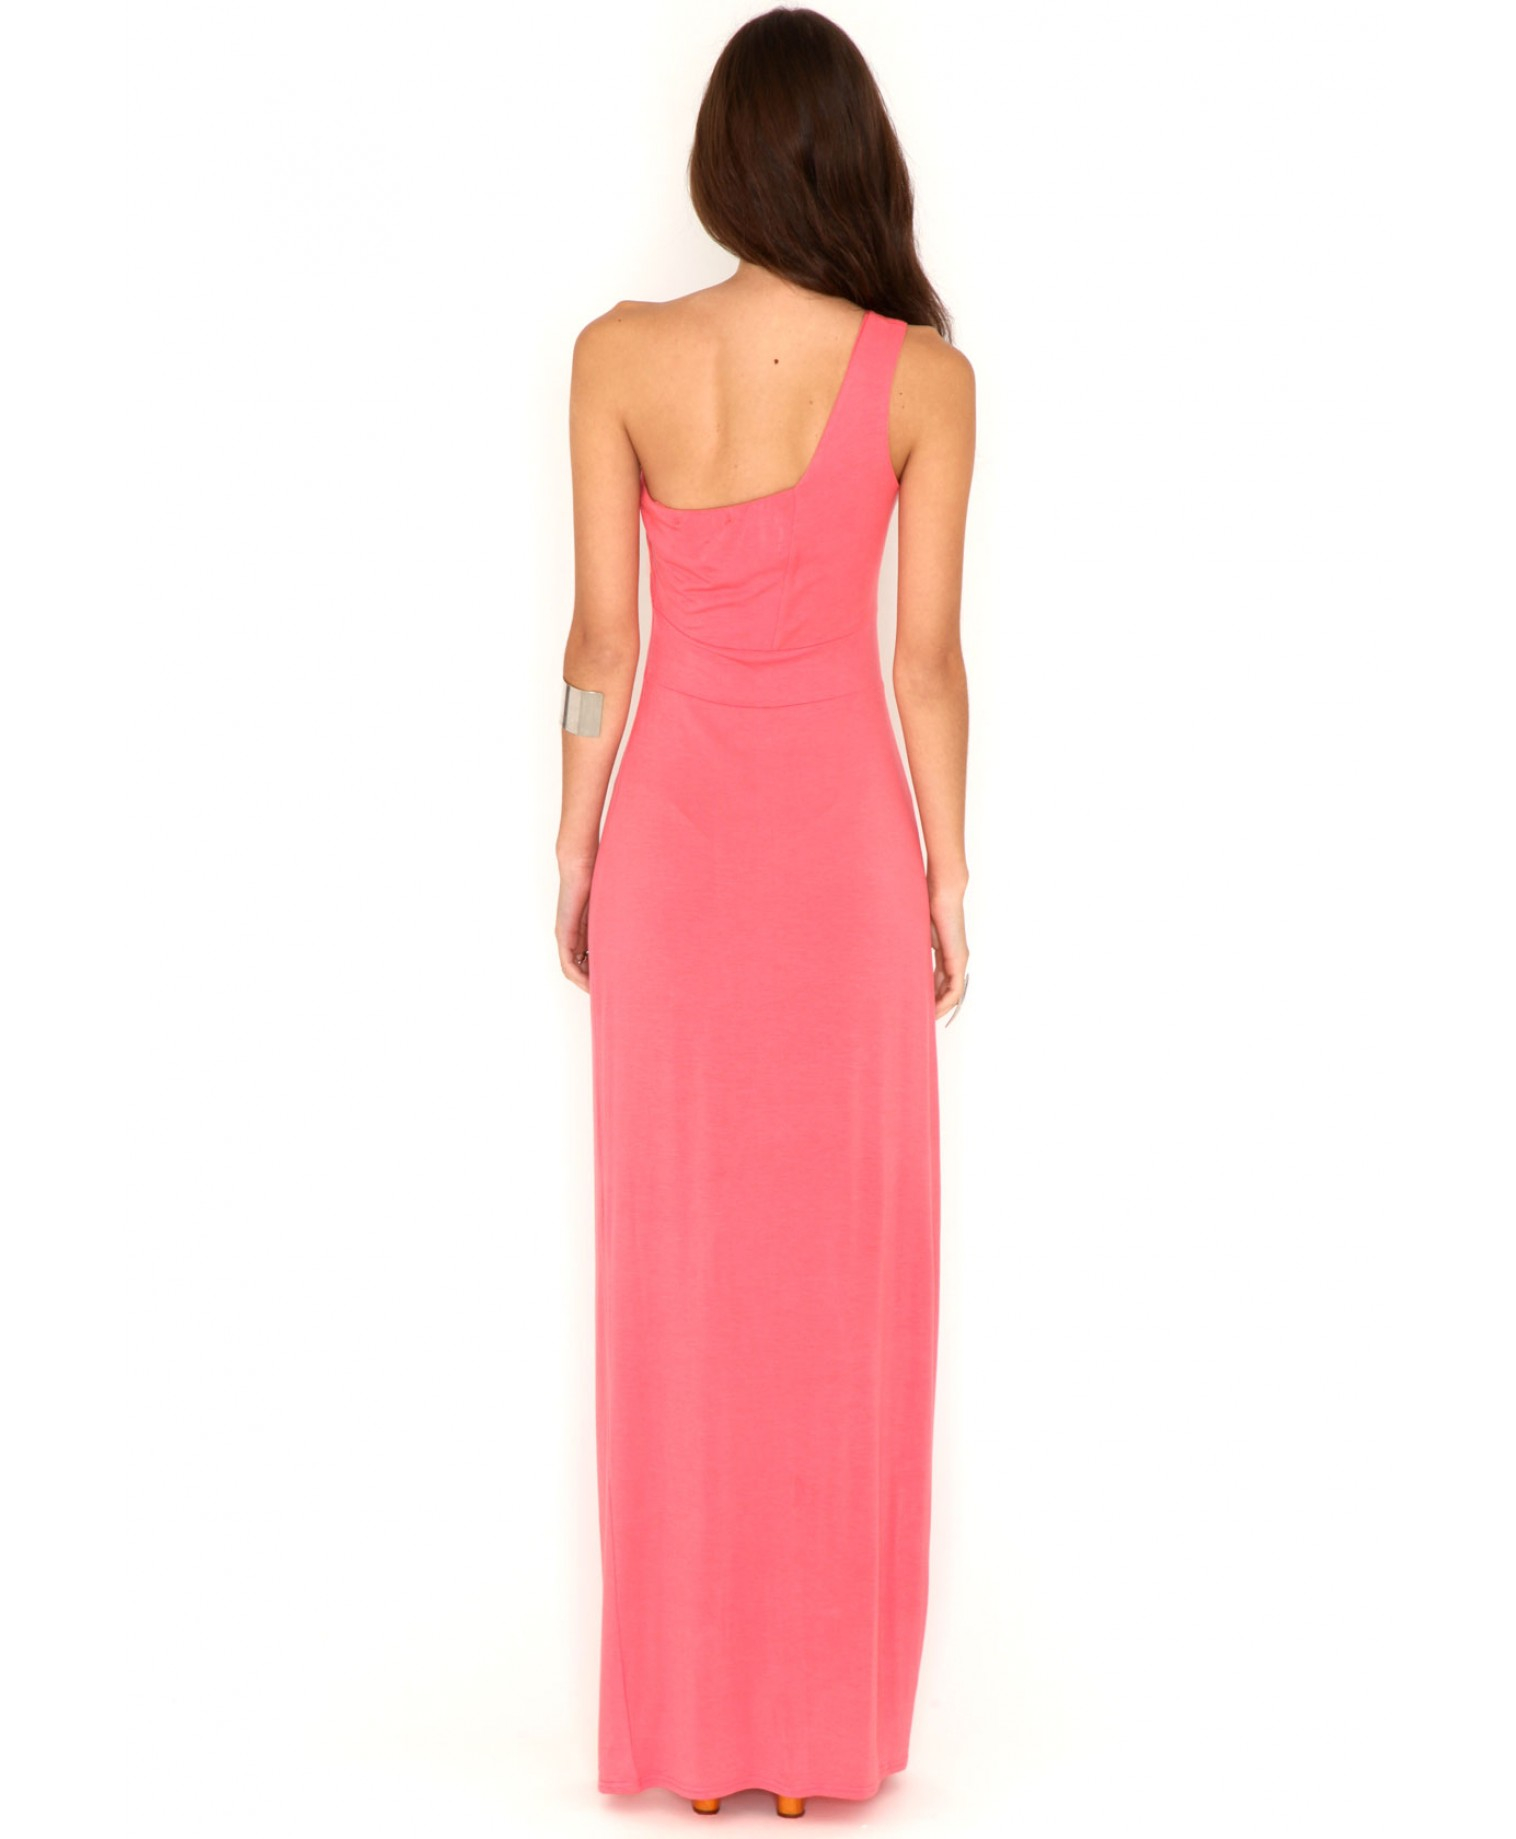 Carniela one shoulder maxi dress in coral